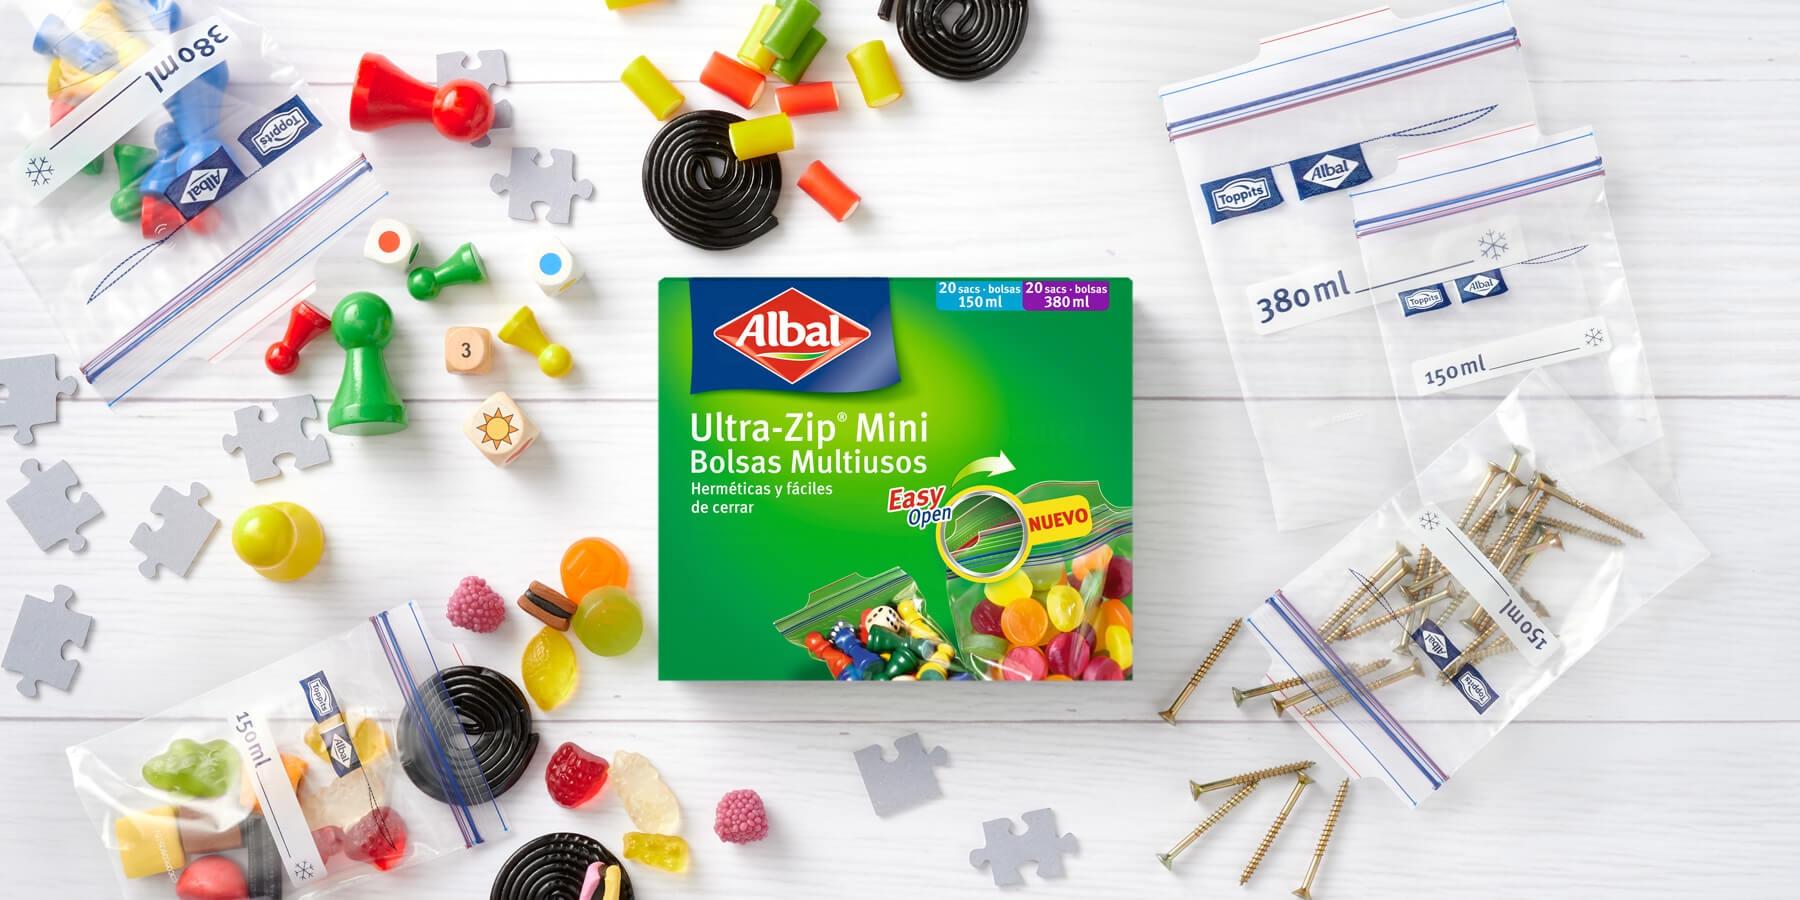 Conserver toutes sortes de petits objets les sacs Multi-usages Ultra-Zip® Mini d'Albal®